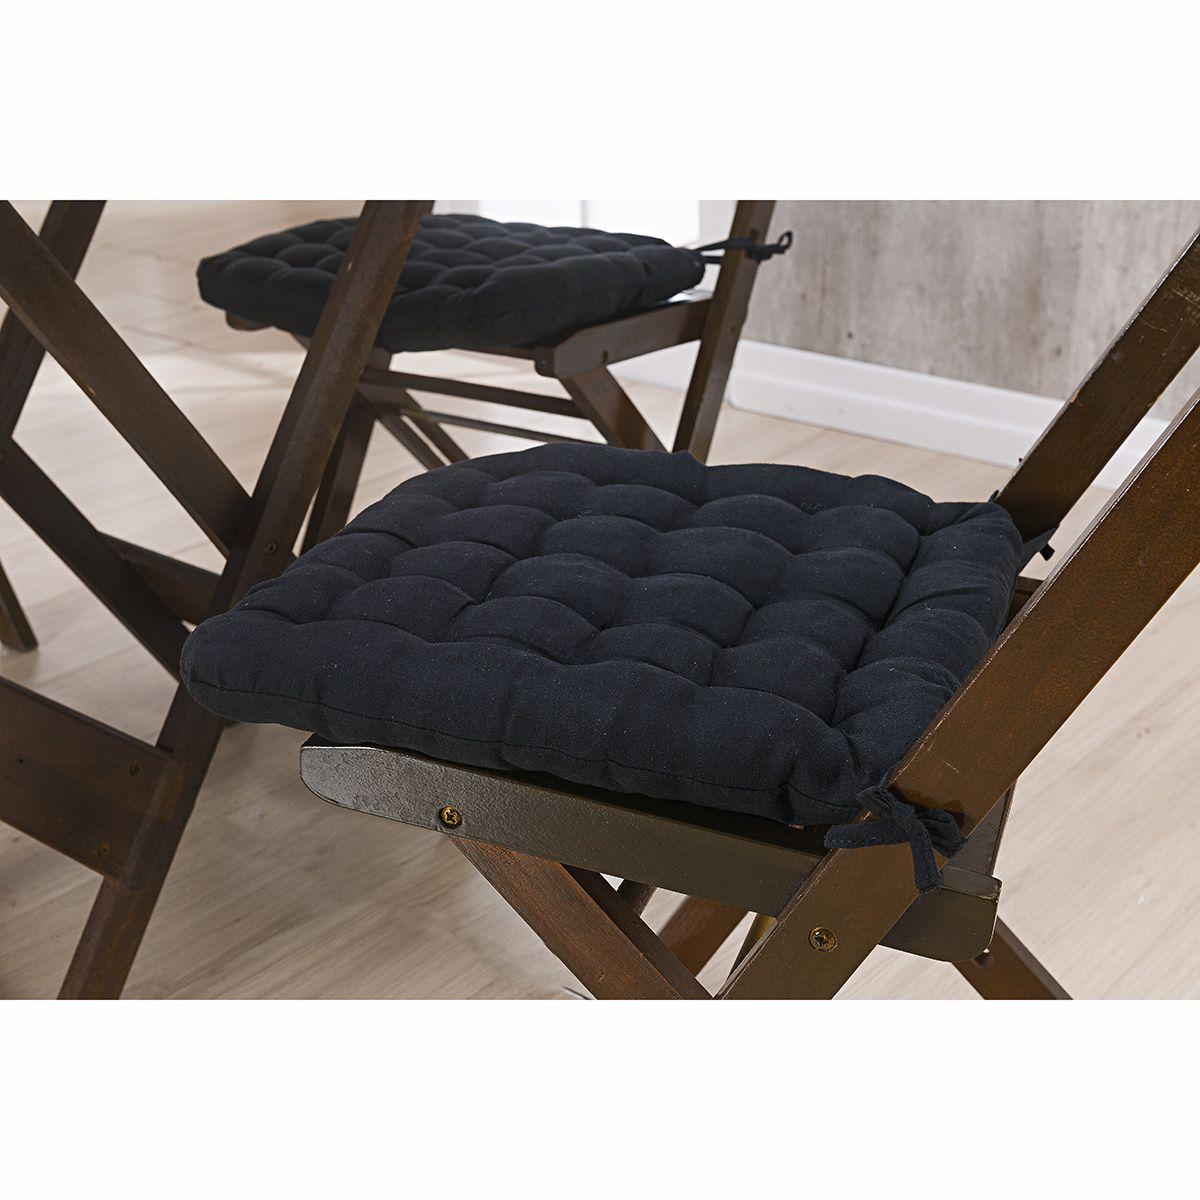 Assento P/ Cadeira - Futton - Kalamar - 40cm x 40cm - Preto - Niazitex